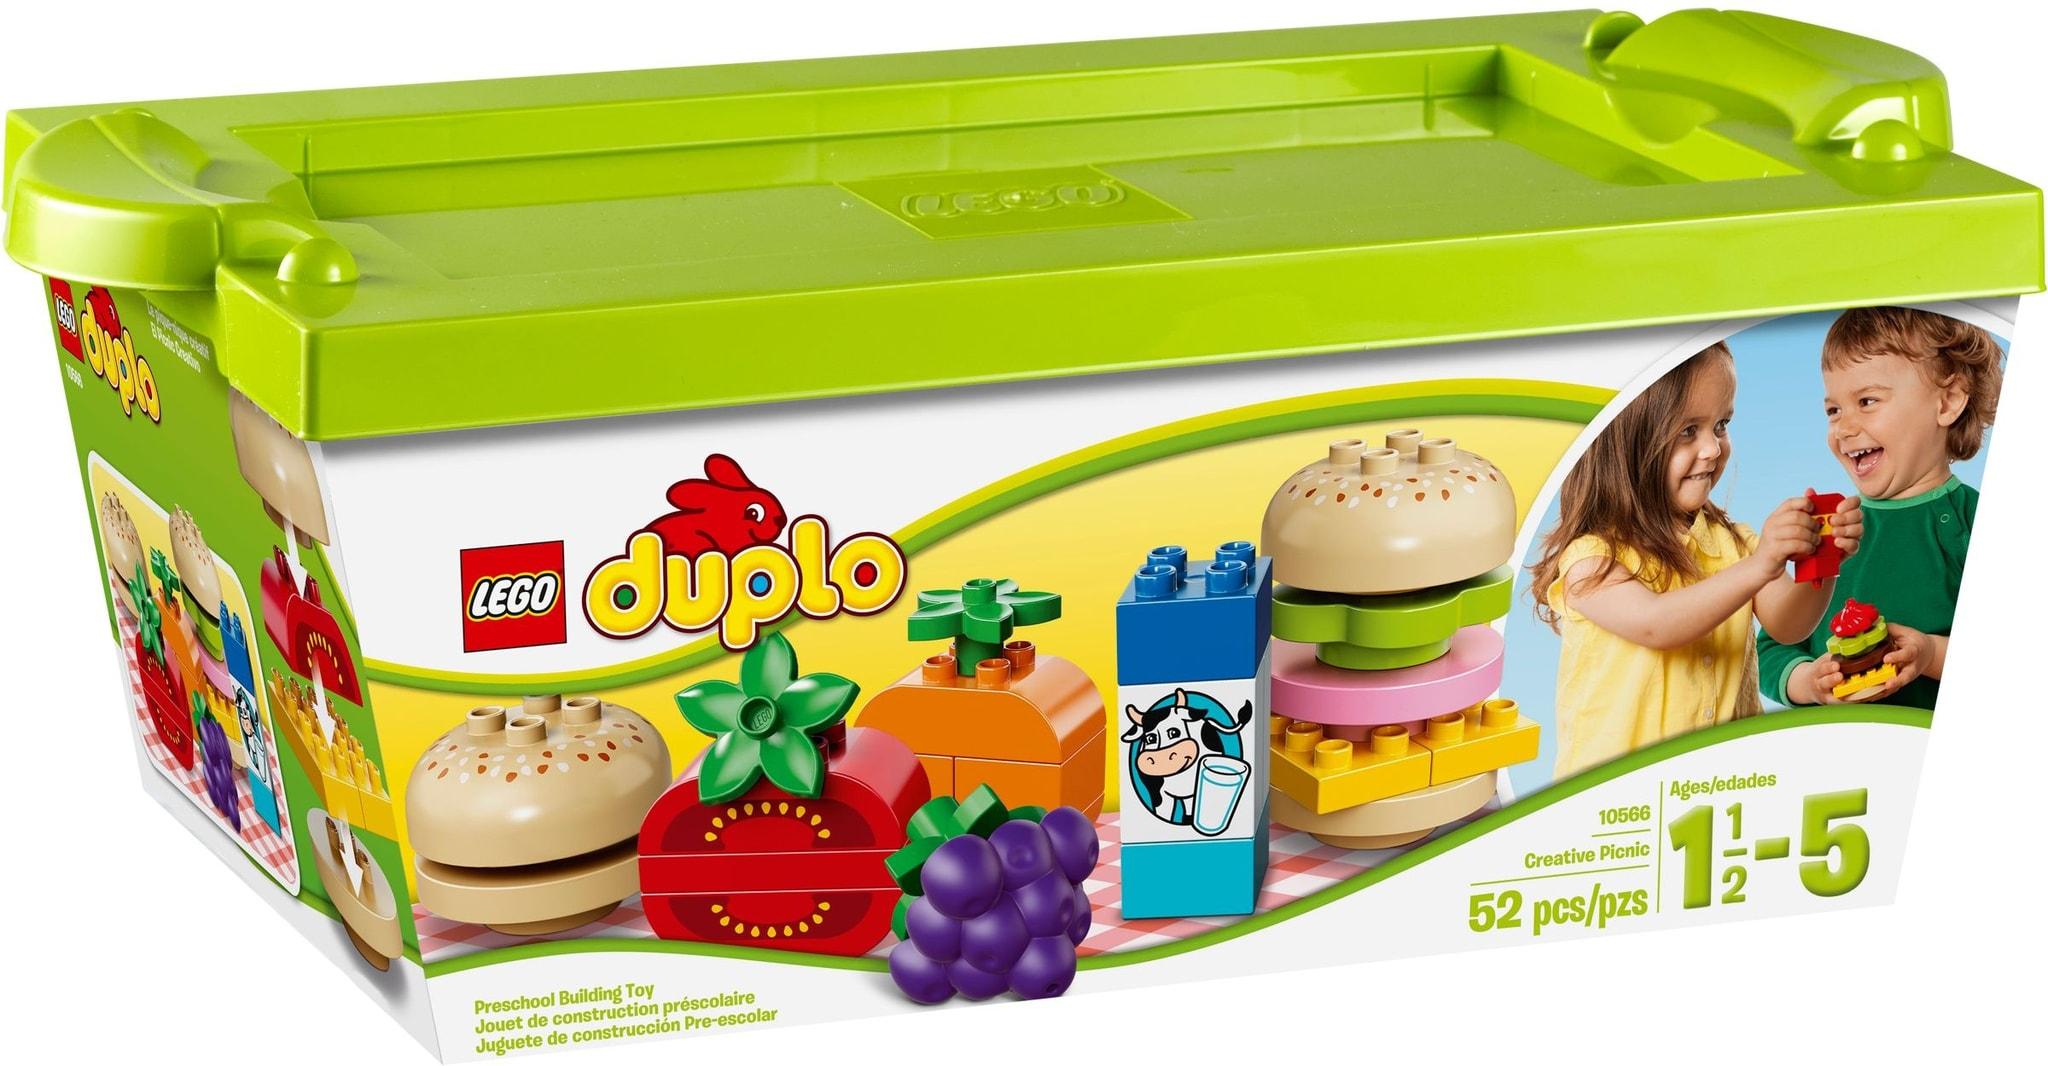 LEGO 10566 - Duplo - Creative Picnic